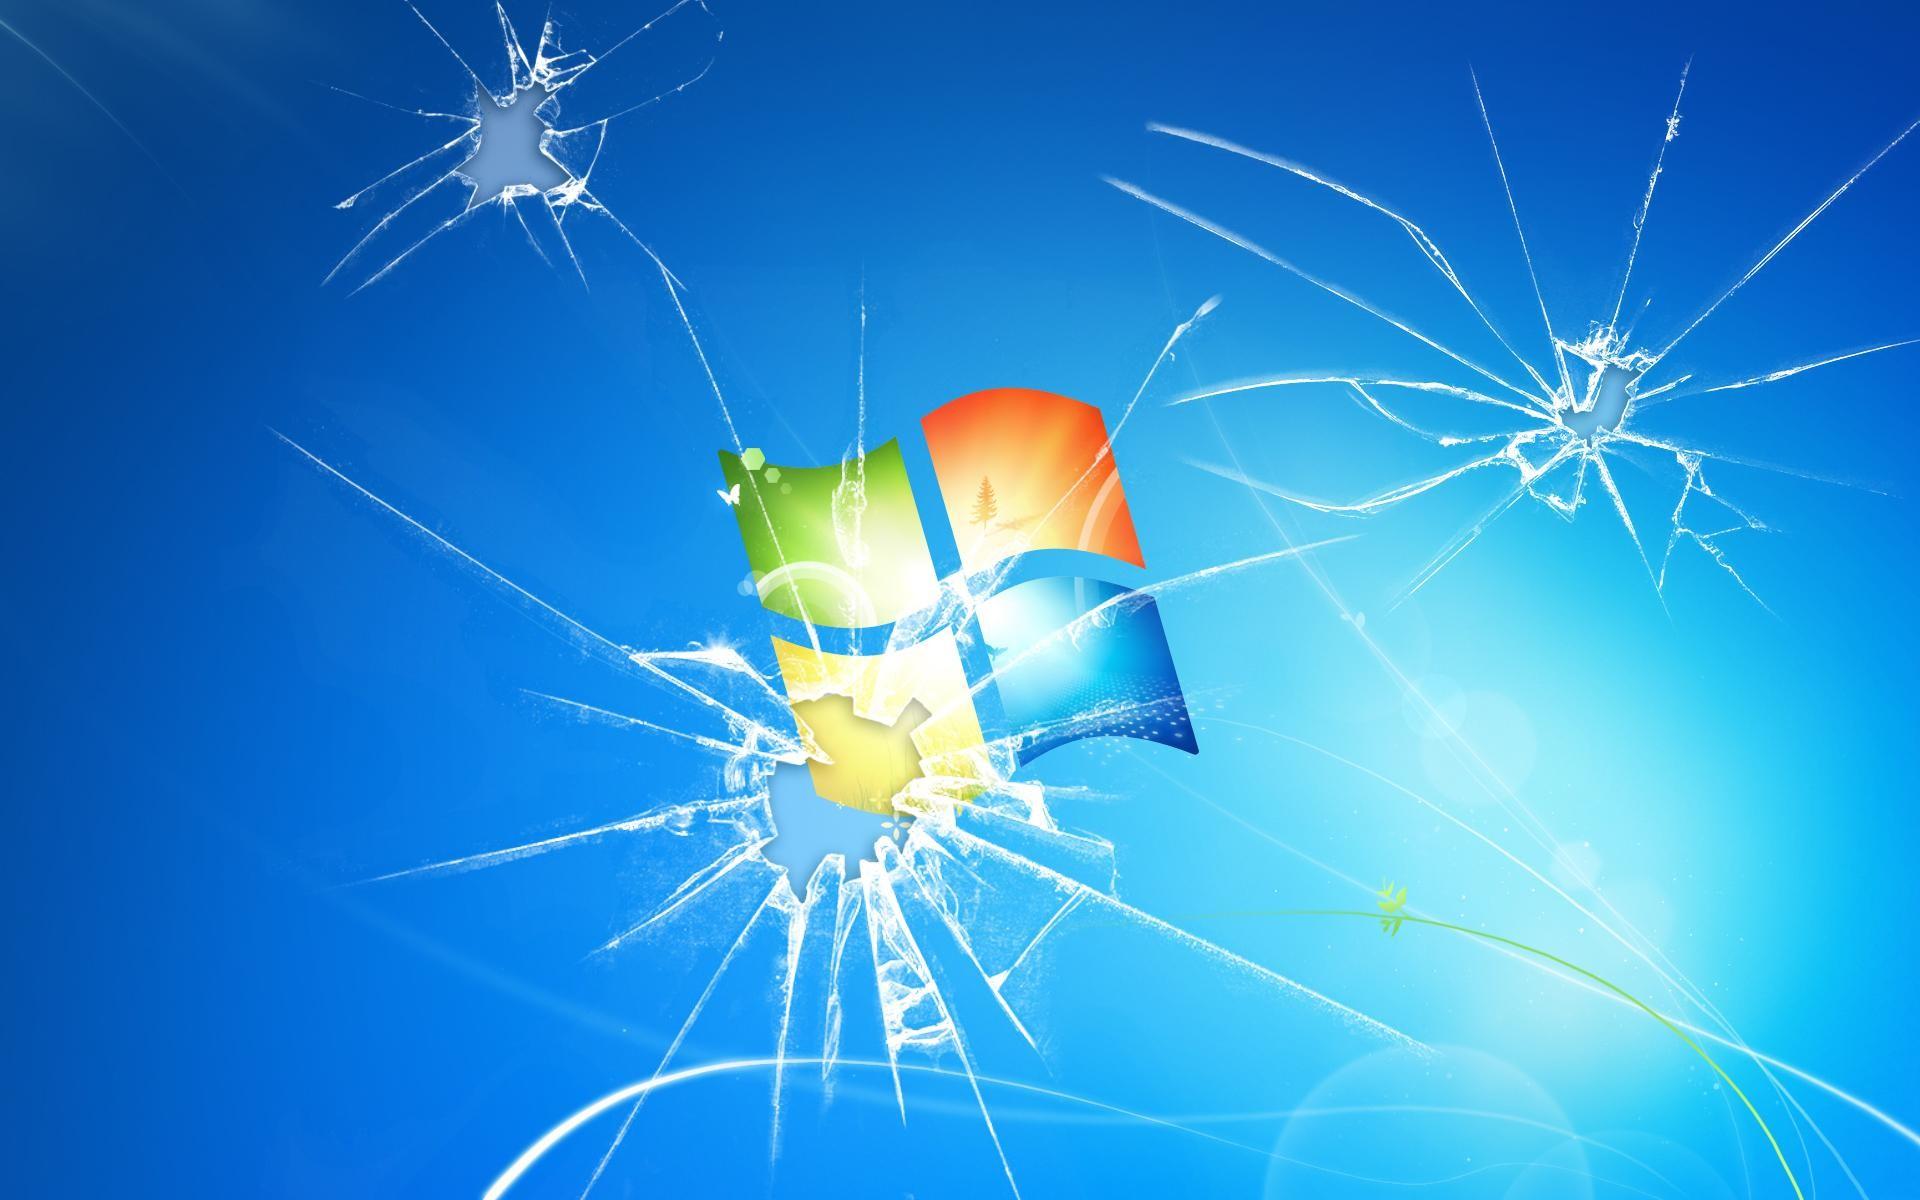 2048x1152 Cracked Screen Wallpaper: Broken Lcd Screen Wallpaper (62+ Images